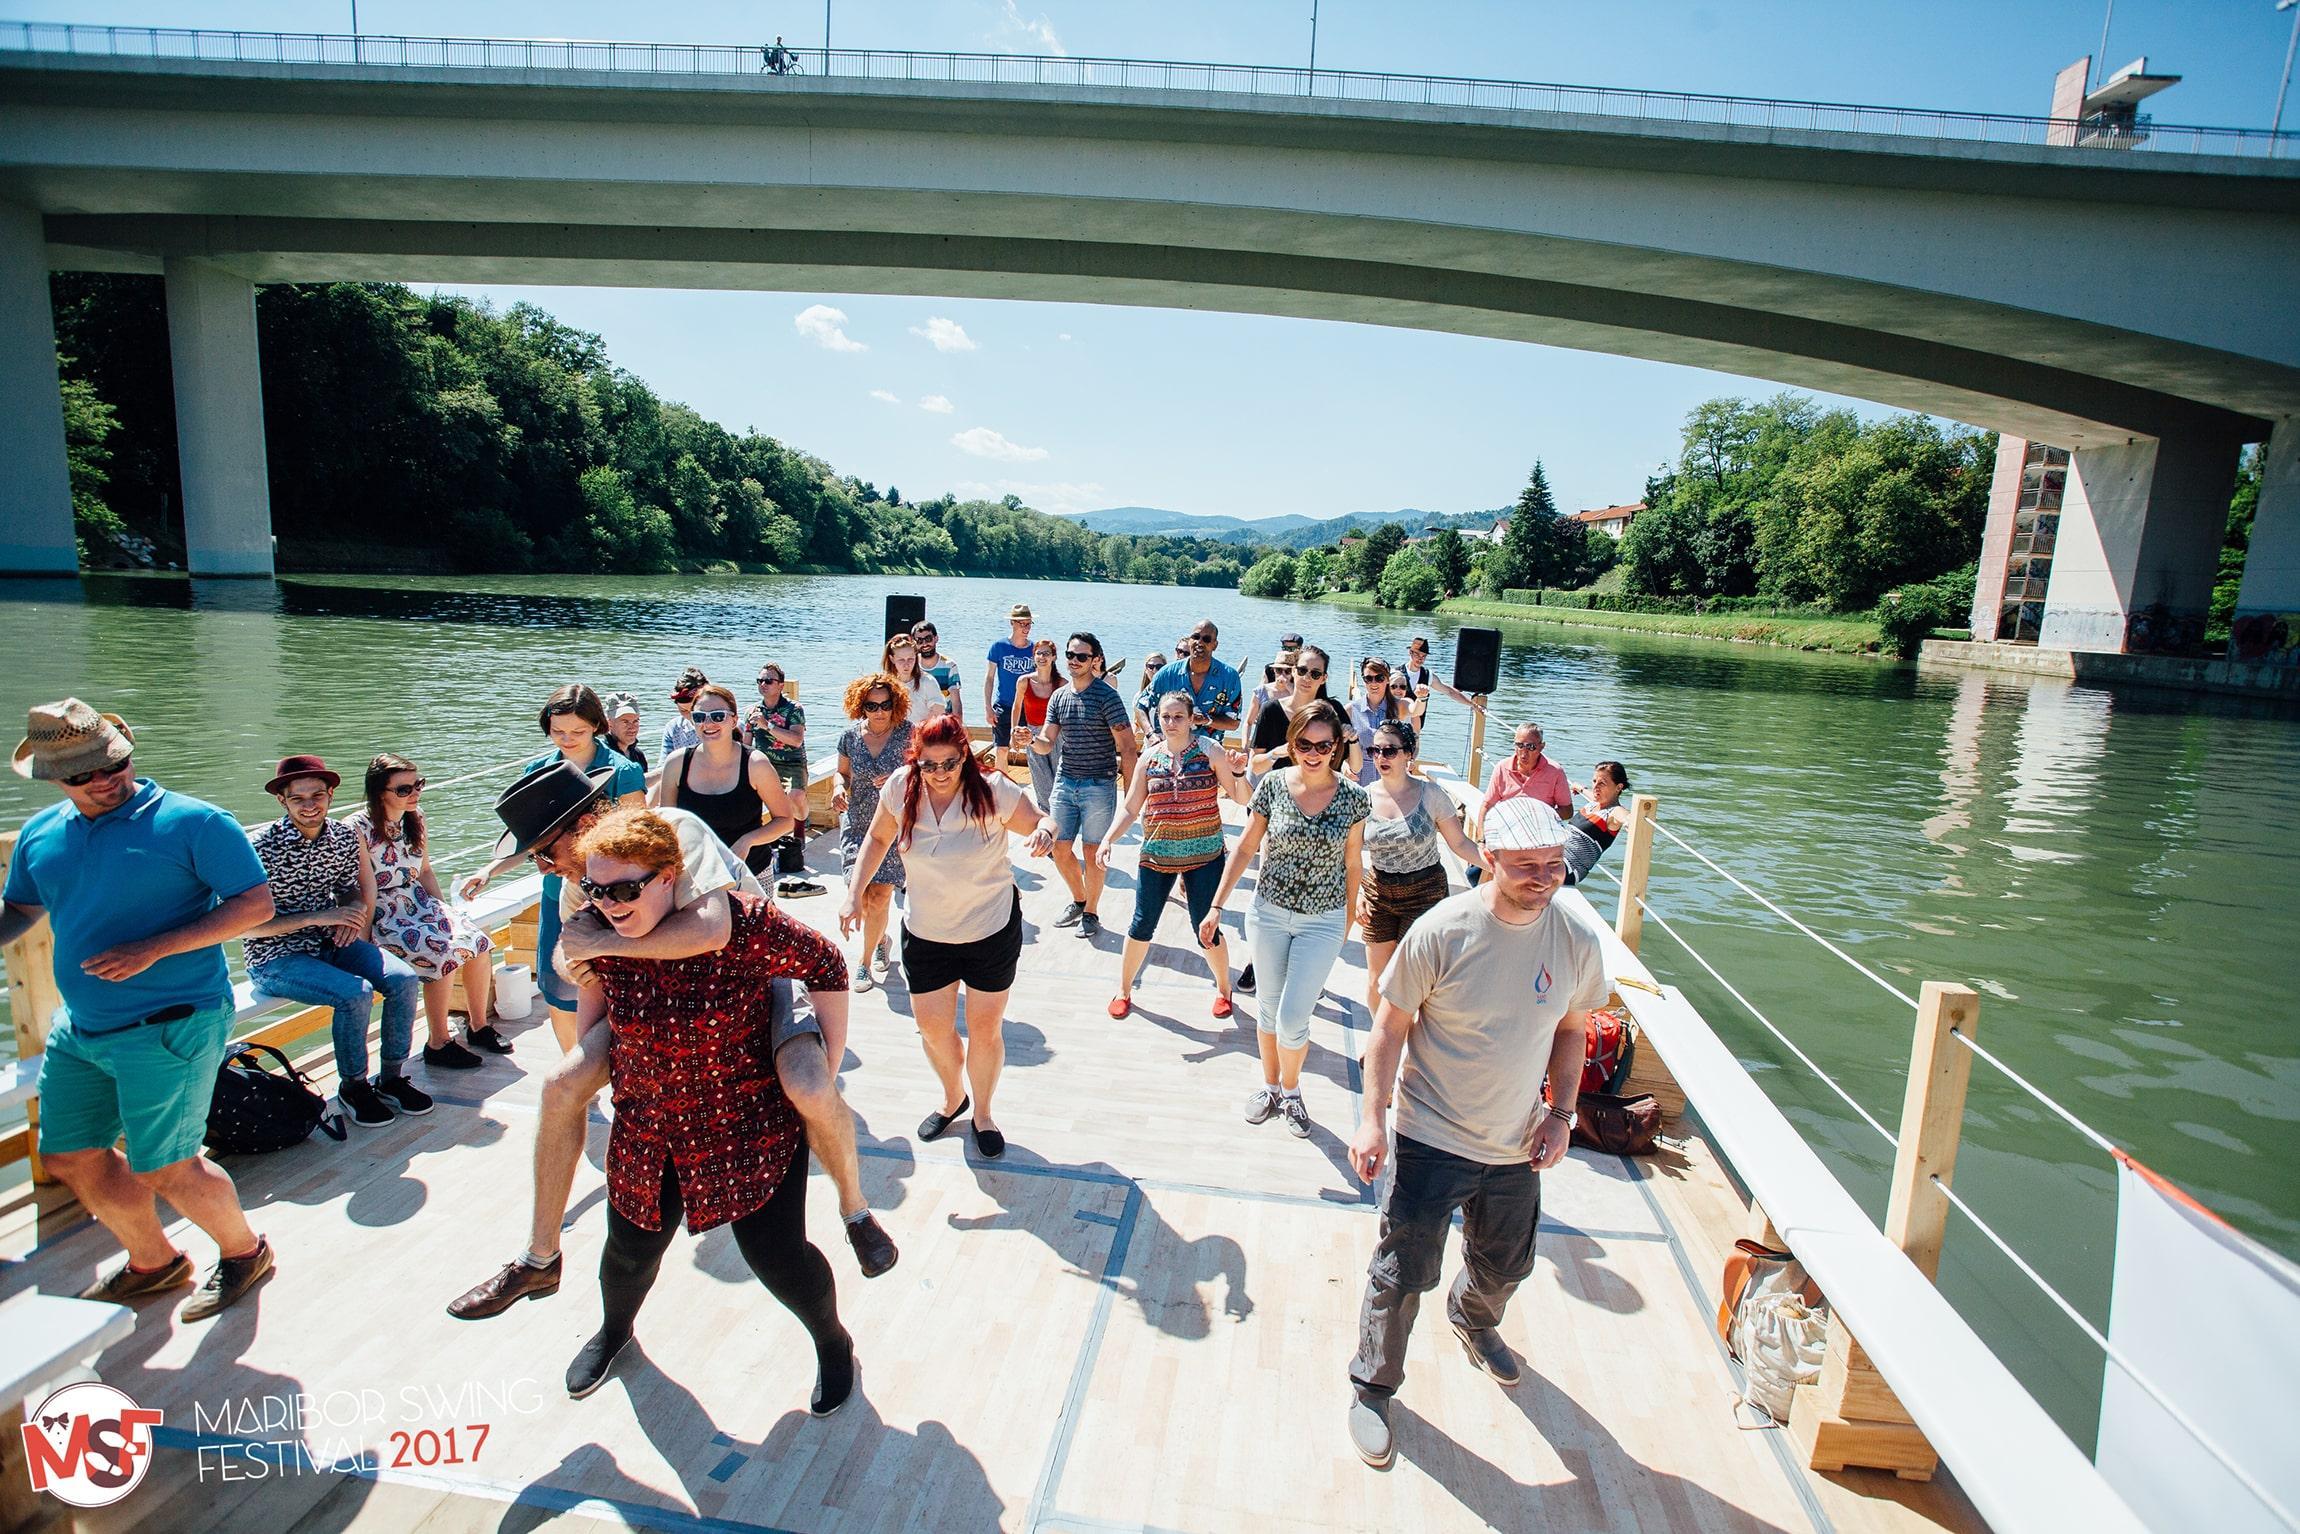 Ples na splavu na reki Dravi image